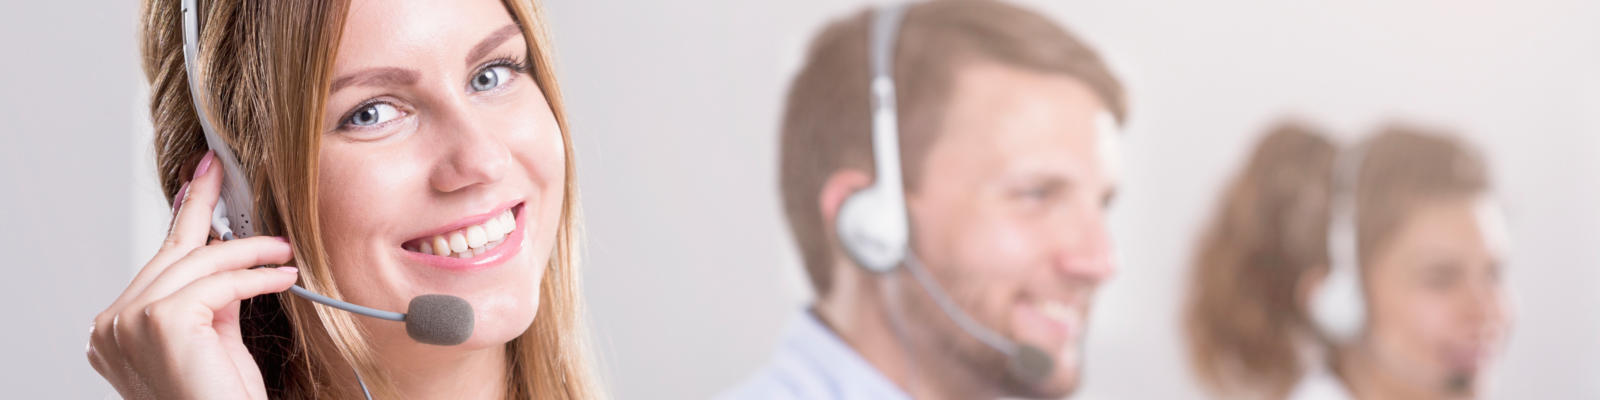 Coaching für Call- & Servicecenter - Zielpunktgenau am Telefon reagieren